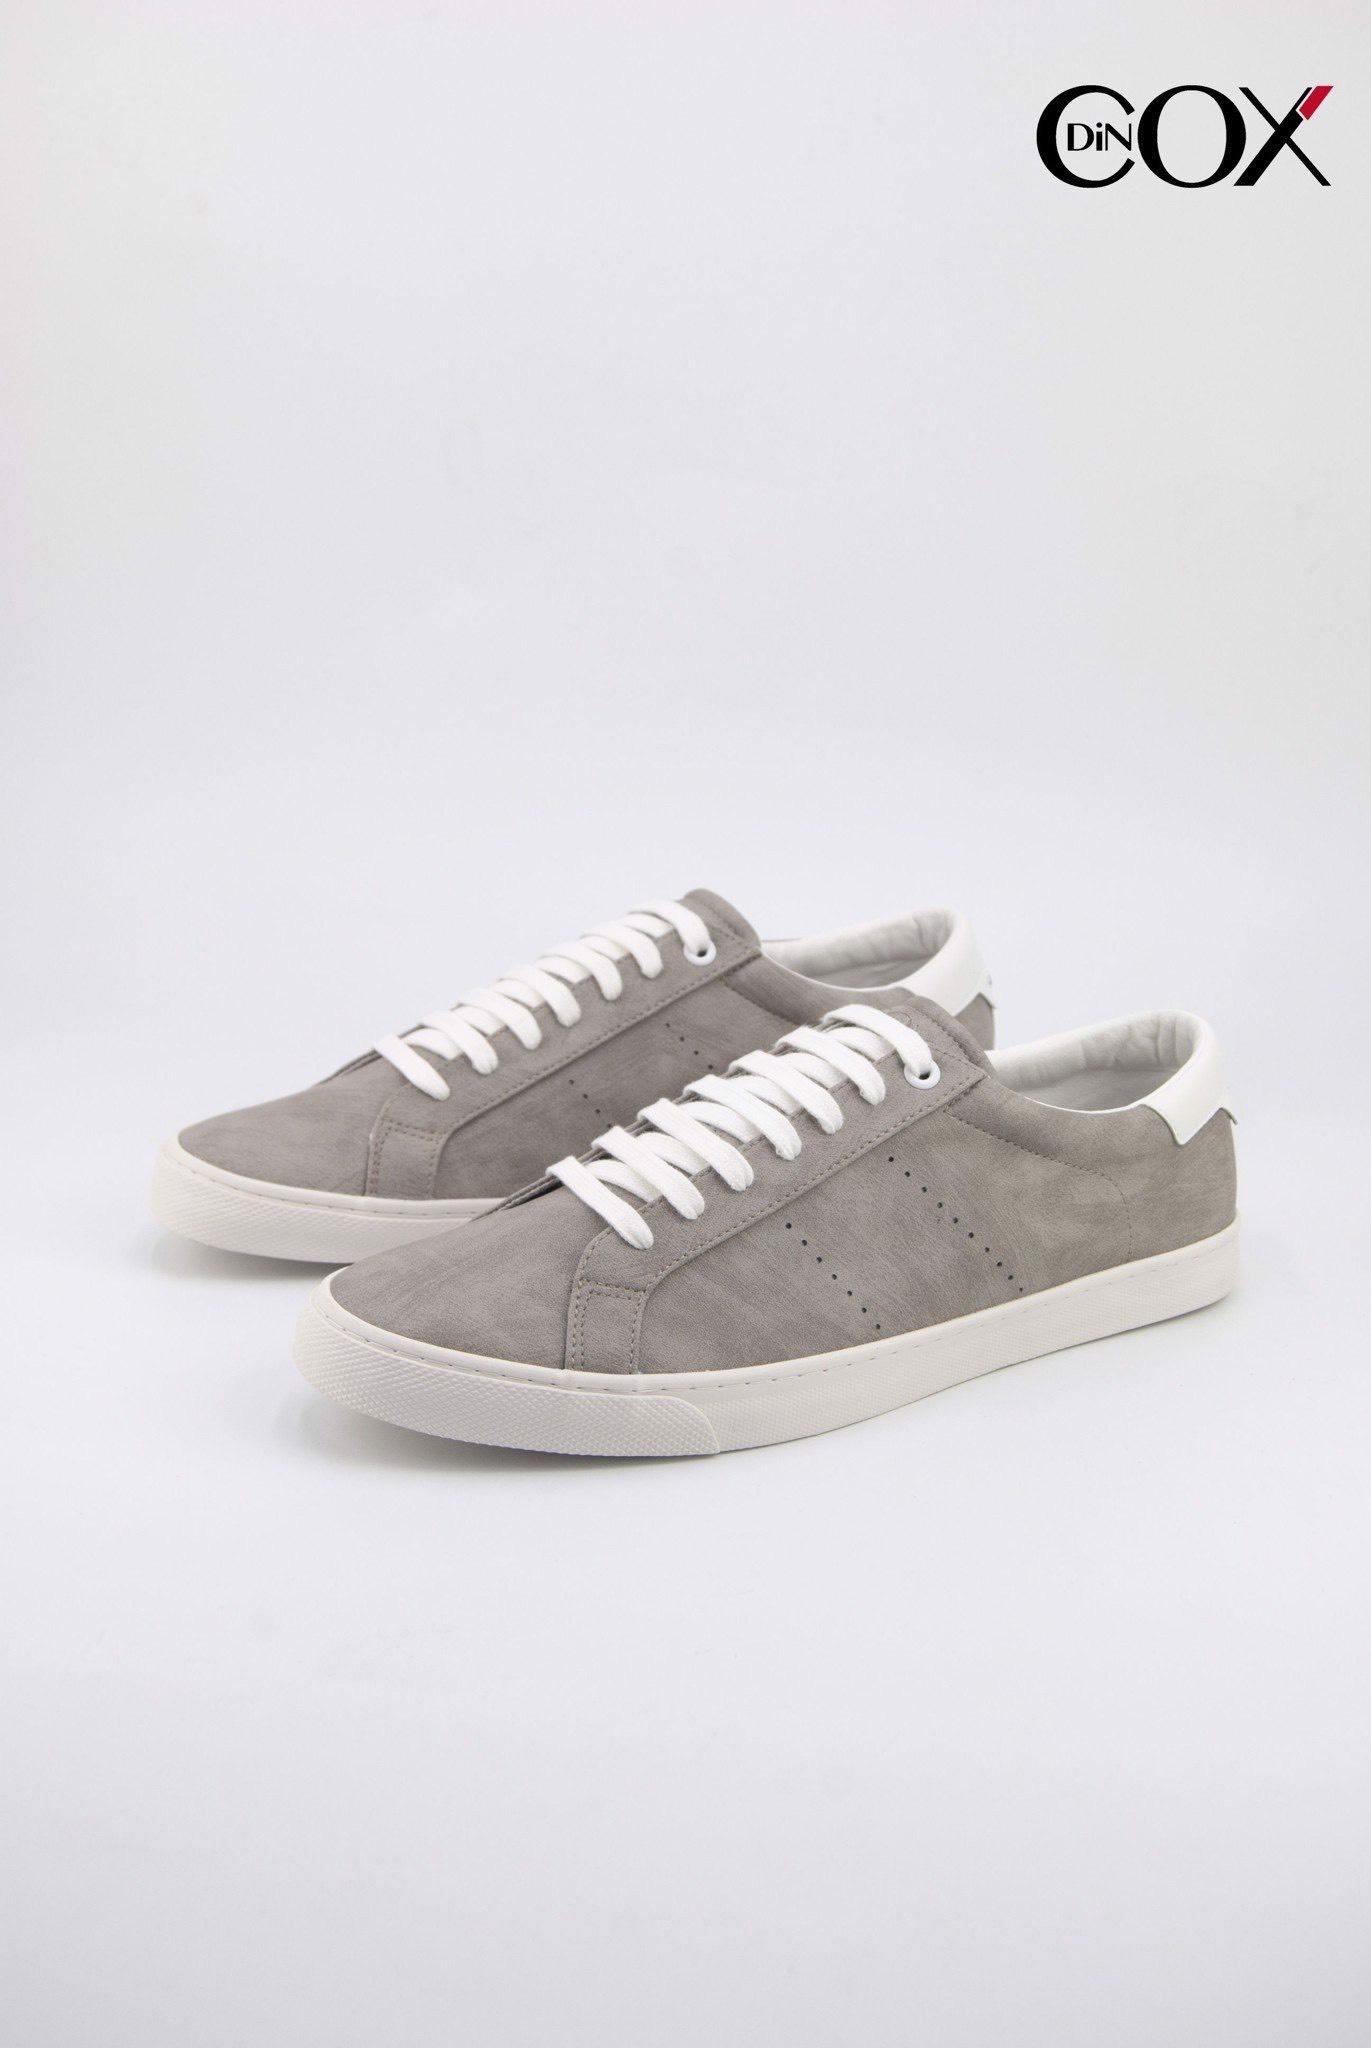 dincox1915-grey